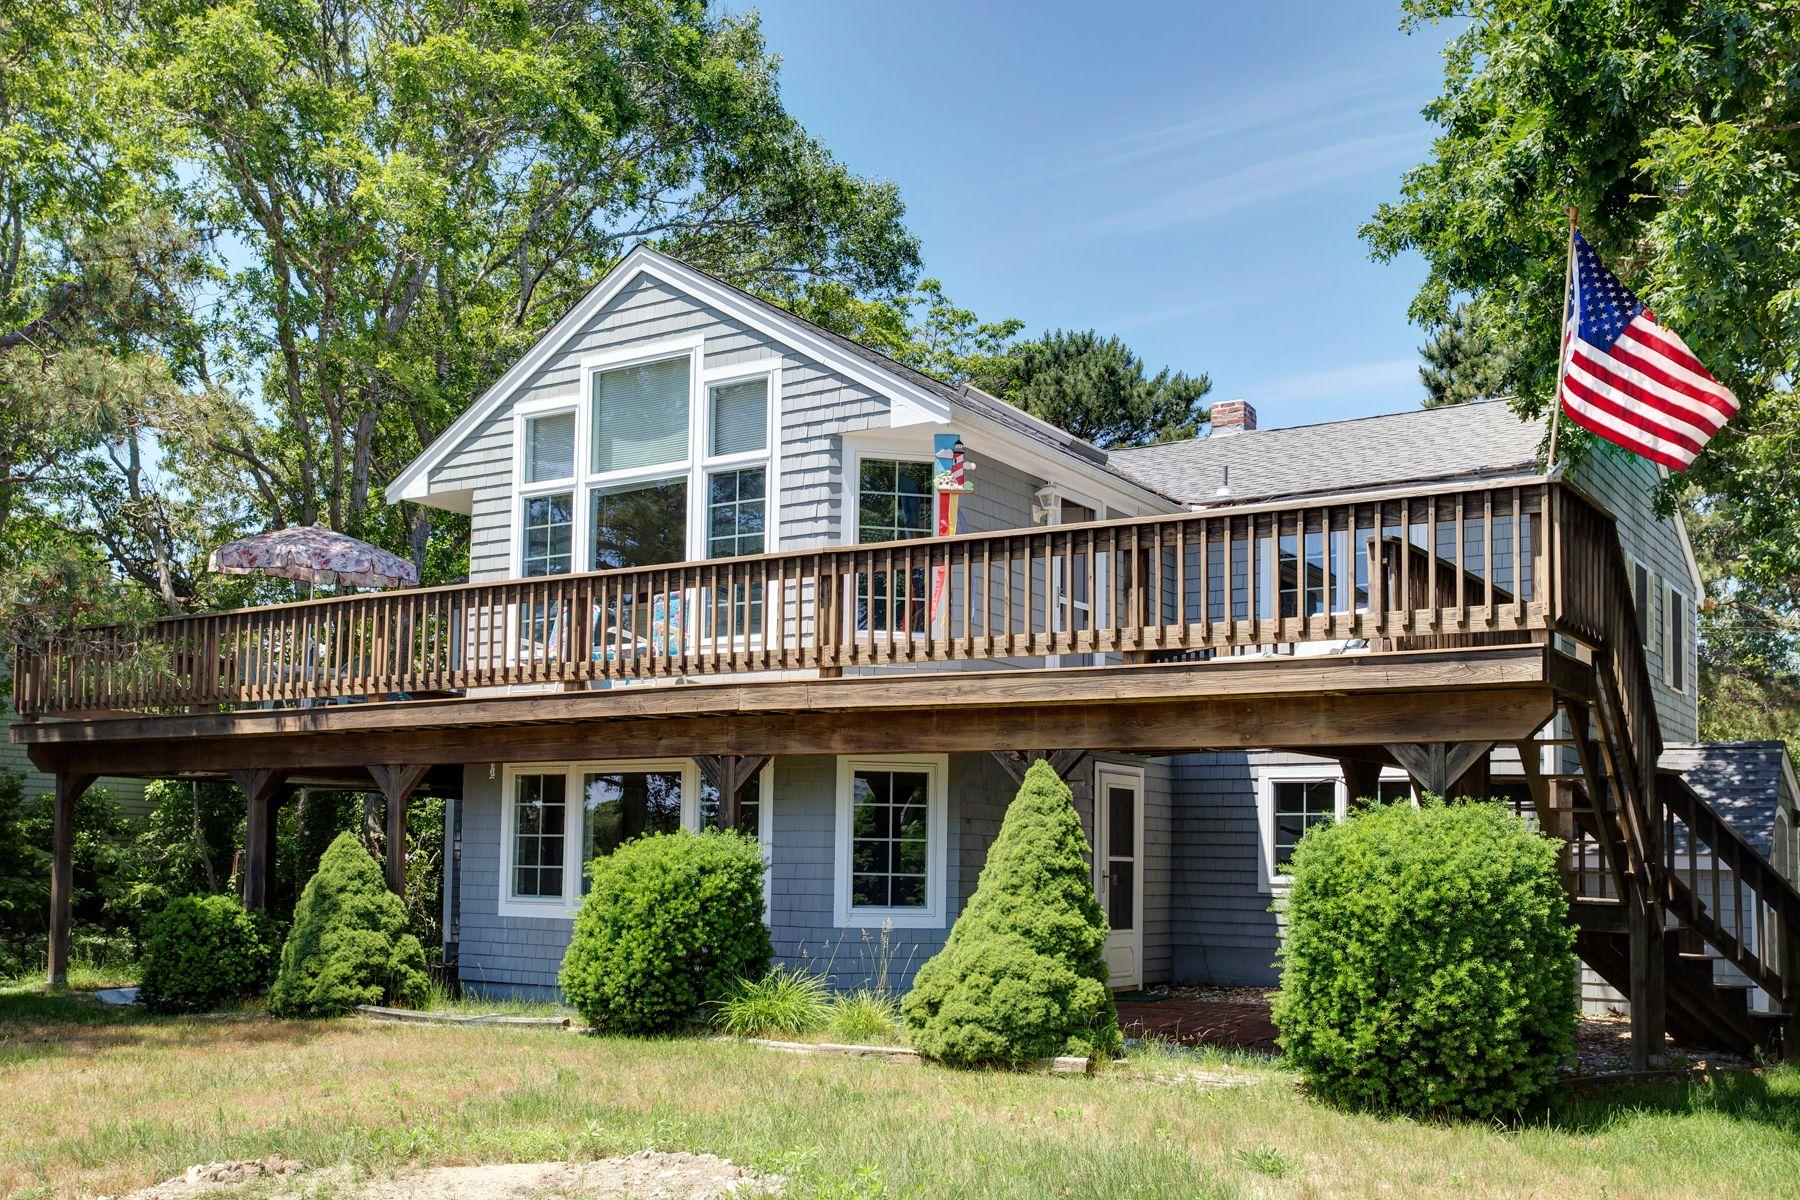 Single Family Homes for Active at 256 Monomoscoy Road Mashpee, Massachusetts 02649 United States